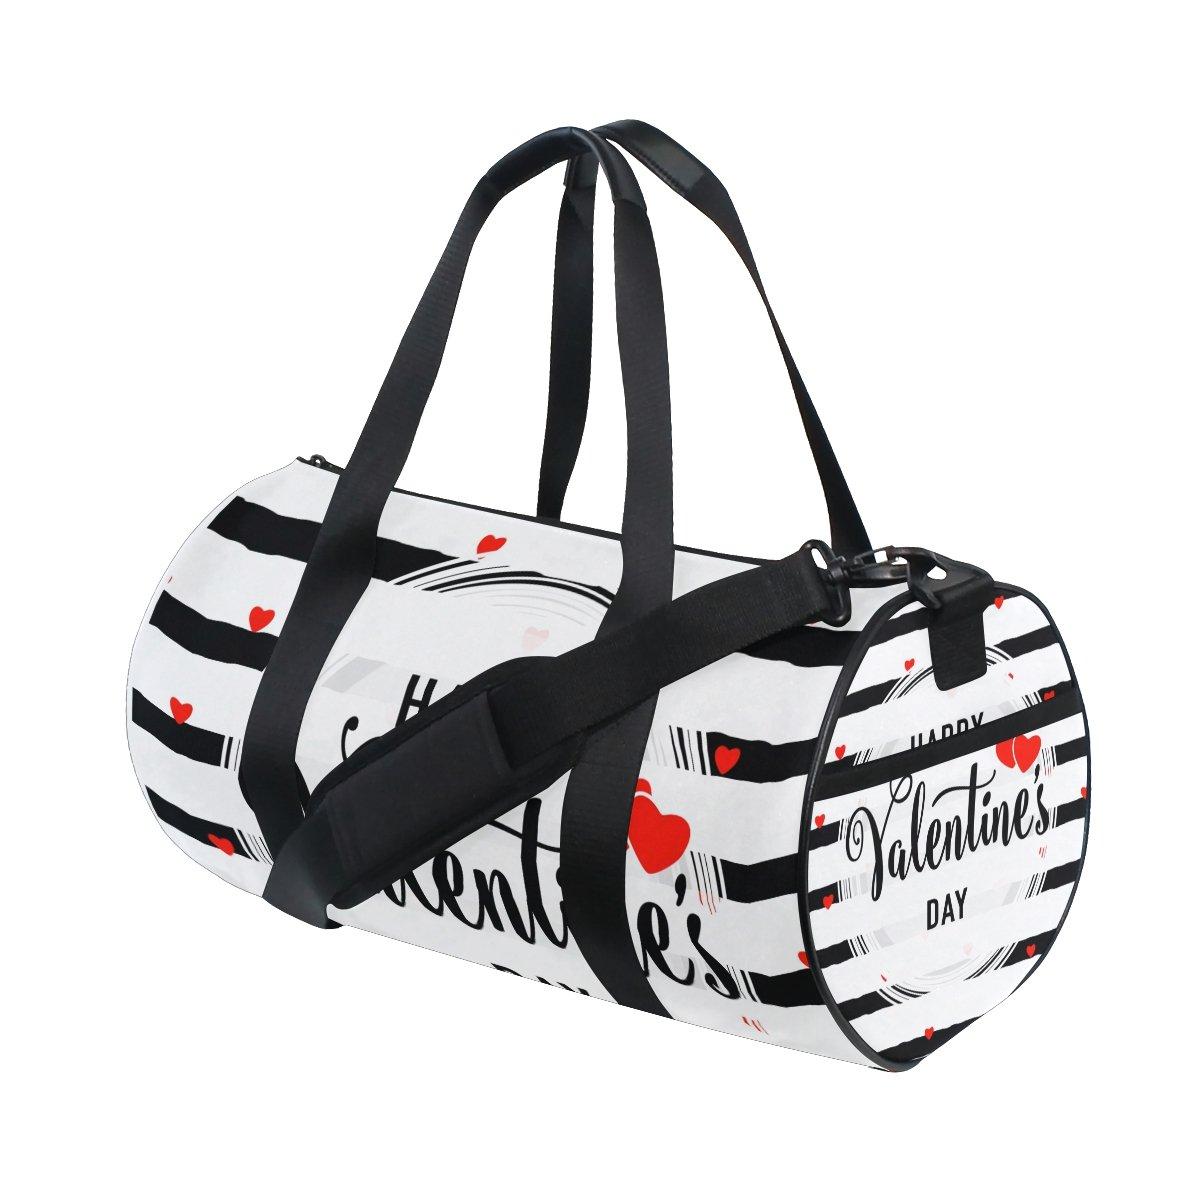 U LIFE Happy Valentines Day Floral Heart Love Sports Gym Shoulder Handy Duffel Bags for Women Men Kids Boys Girls